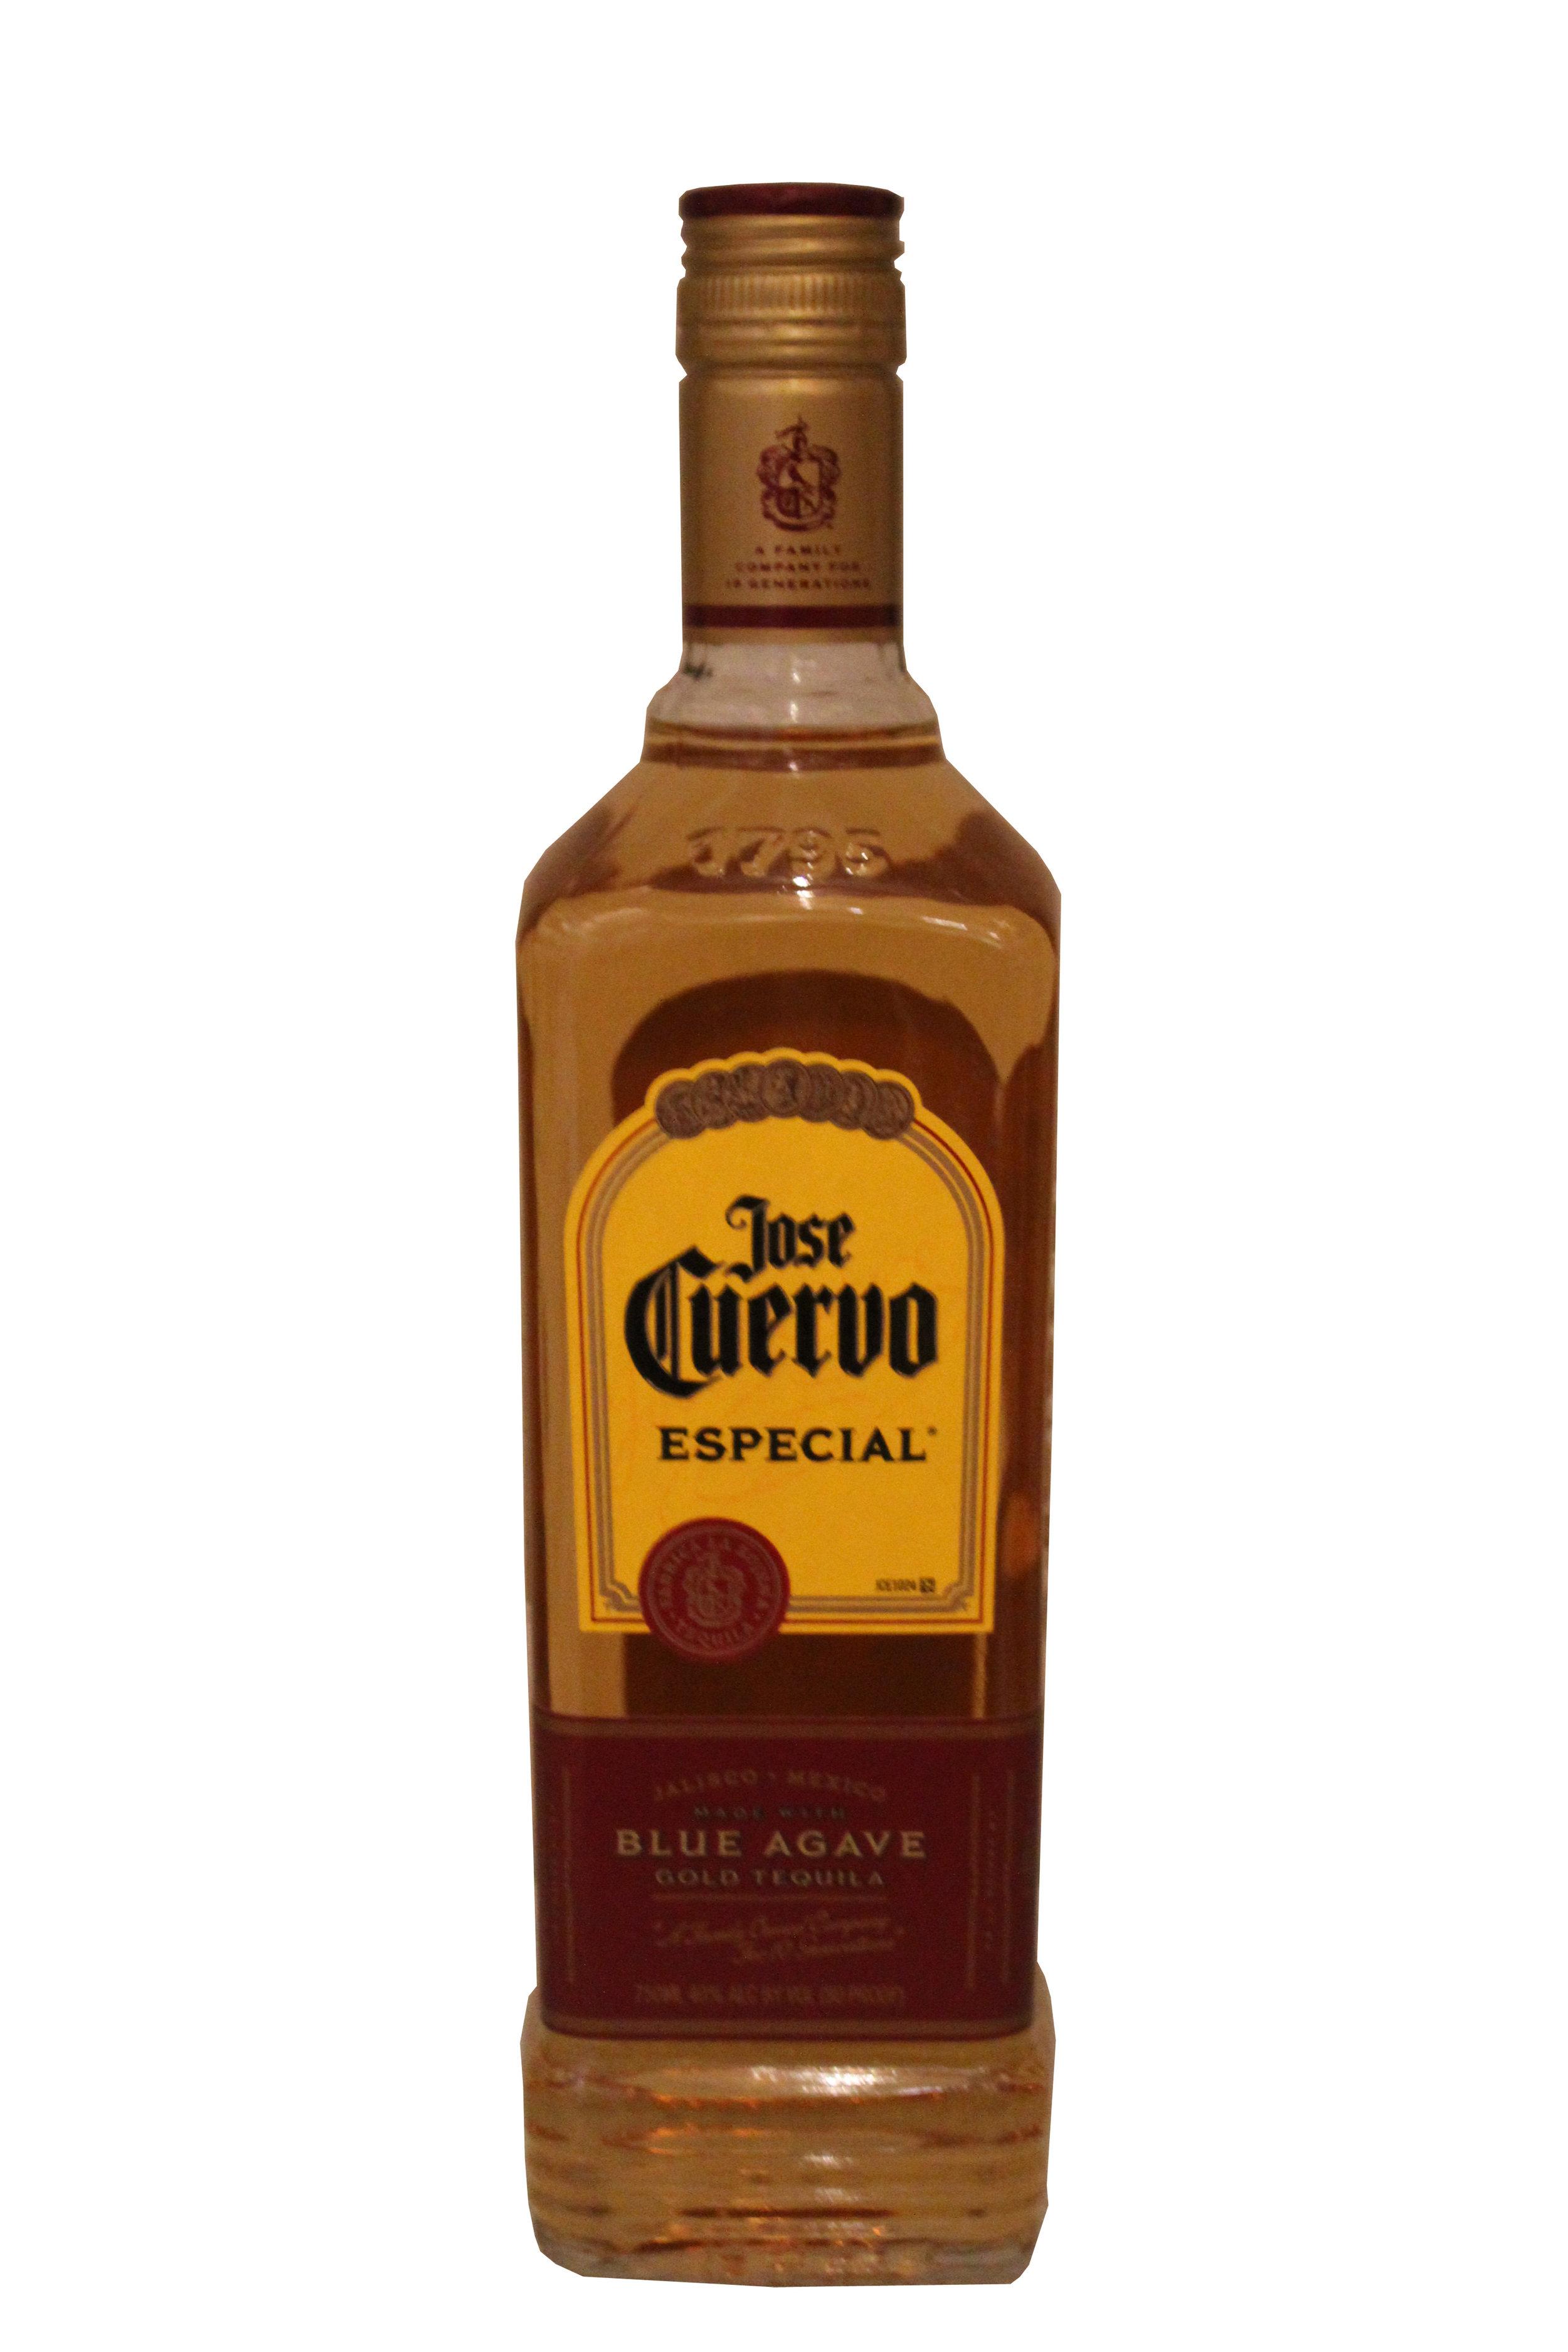 Especial Aged Tequila  Jose Cuervo, Mexico